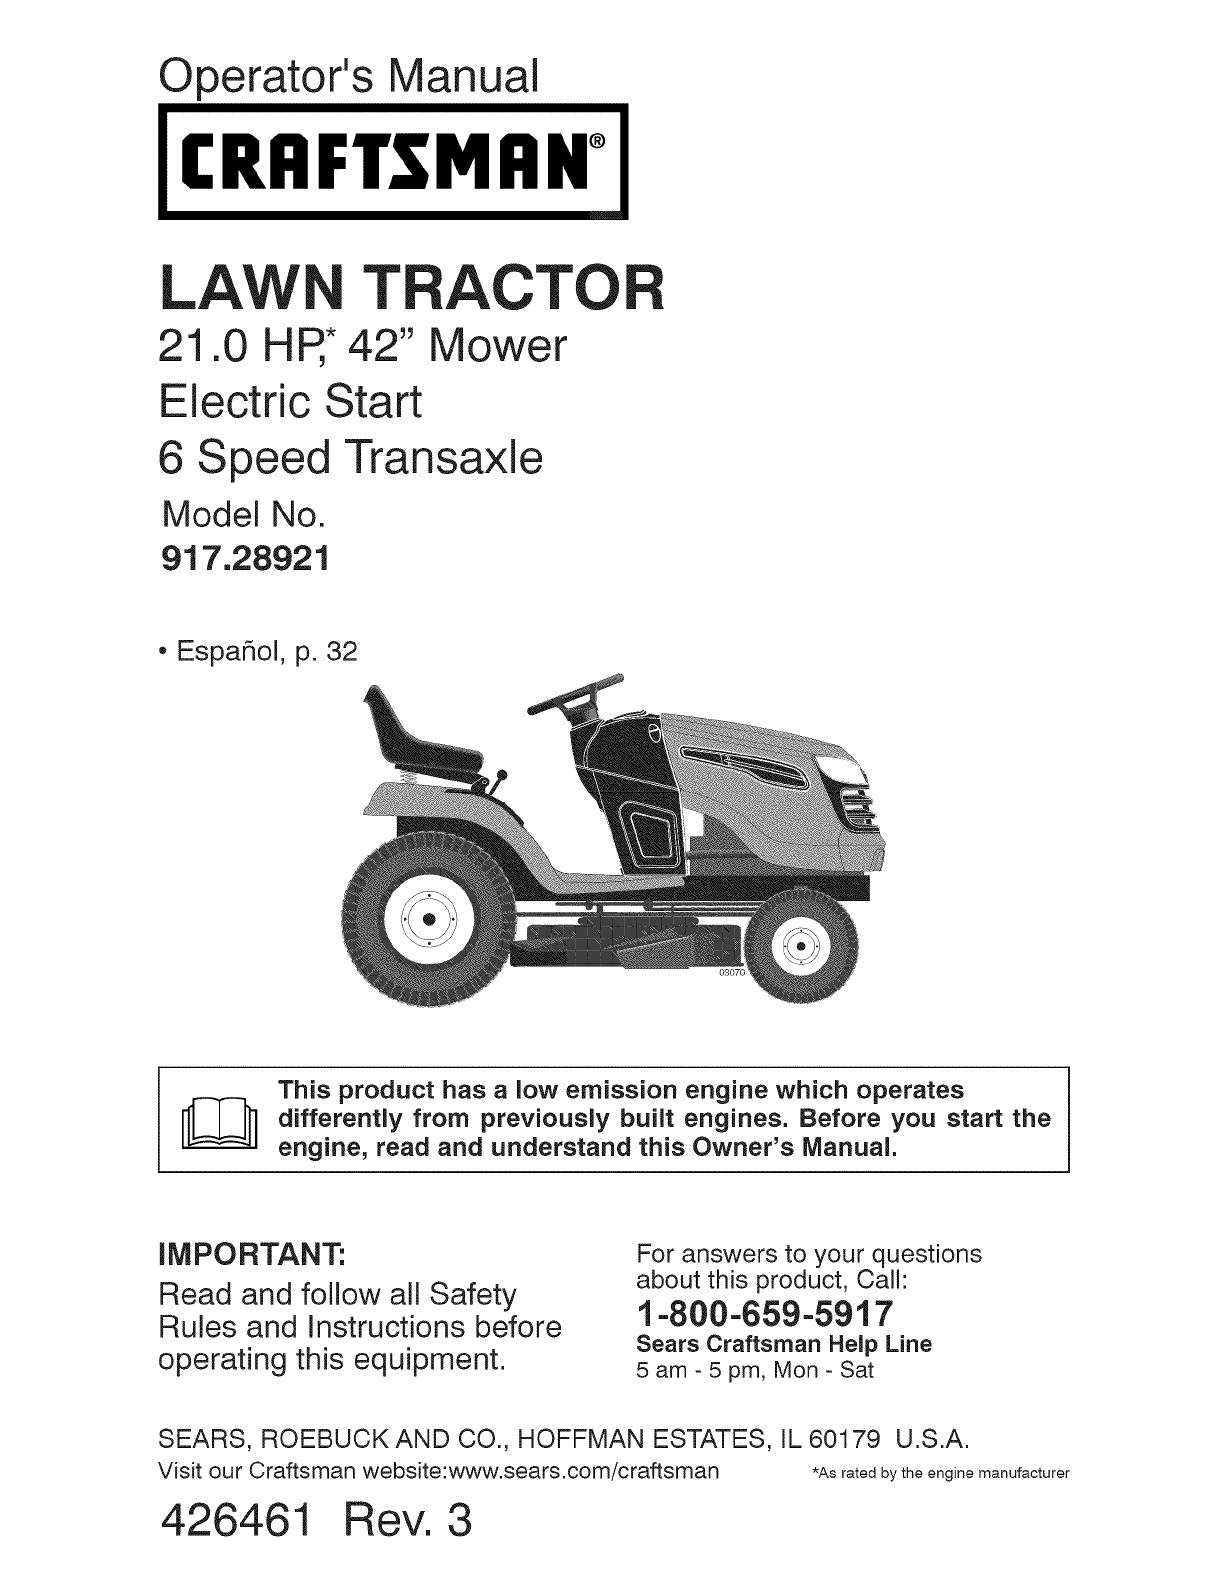 Wiring Diagram Craftsman 917 287480 Library Sears Lawn Tractor 289470 Mower Car Diagrams 54 Zero Turn